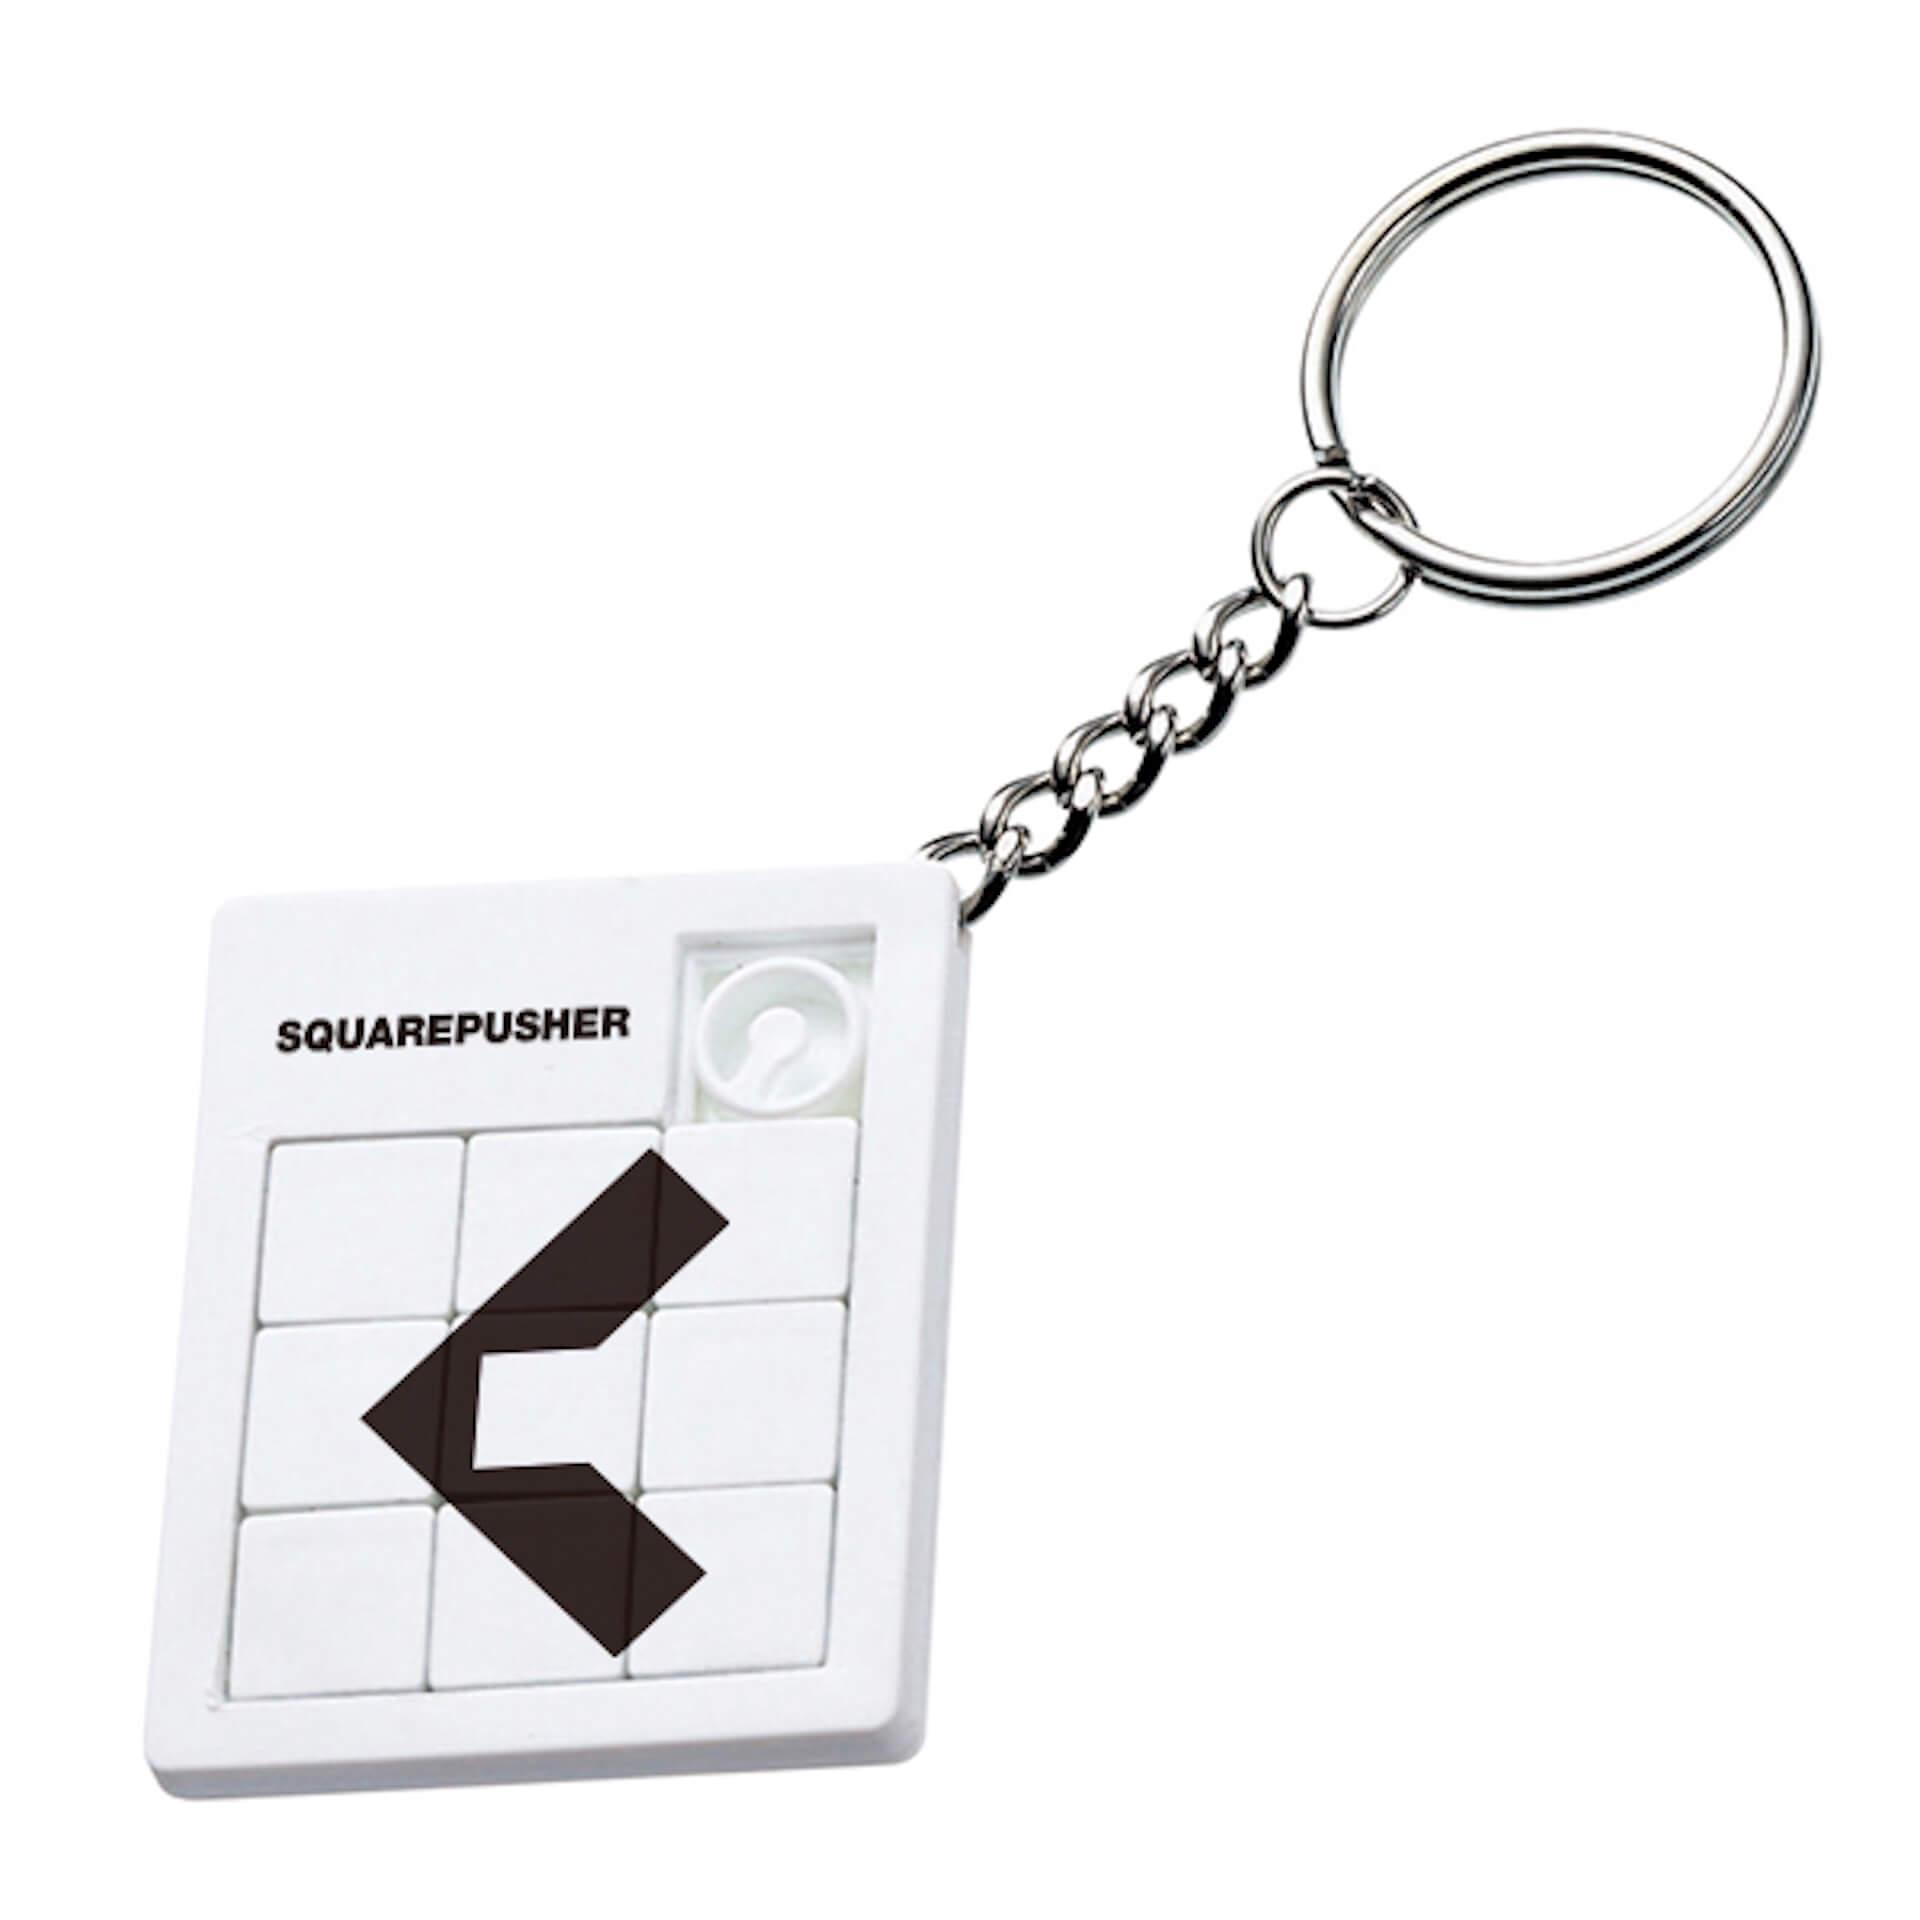 Squarepusherデビューアルバム『Feed Me Weird Things』再発盤が本日ついに発売!待望のサブスクも解禁 music210604_squarepusher_1